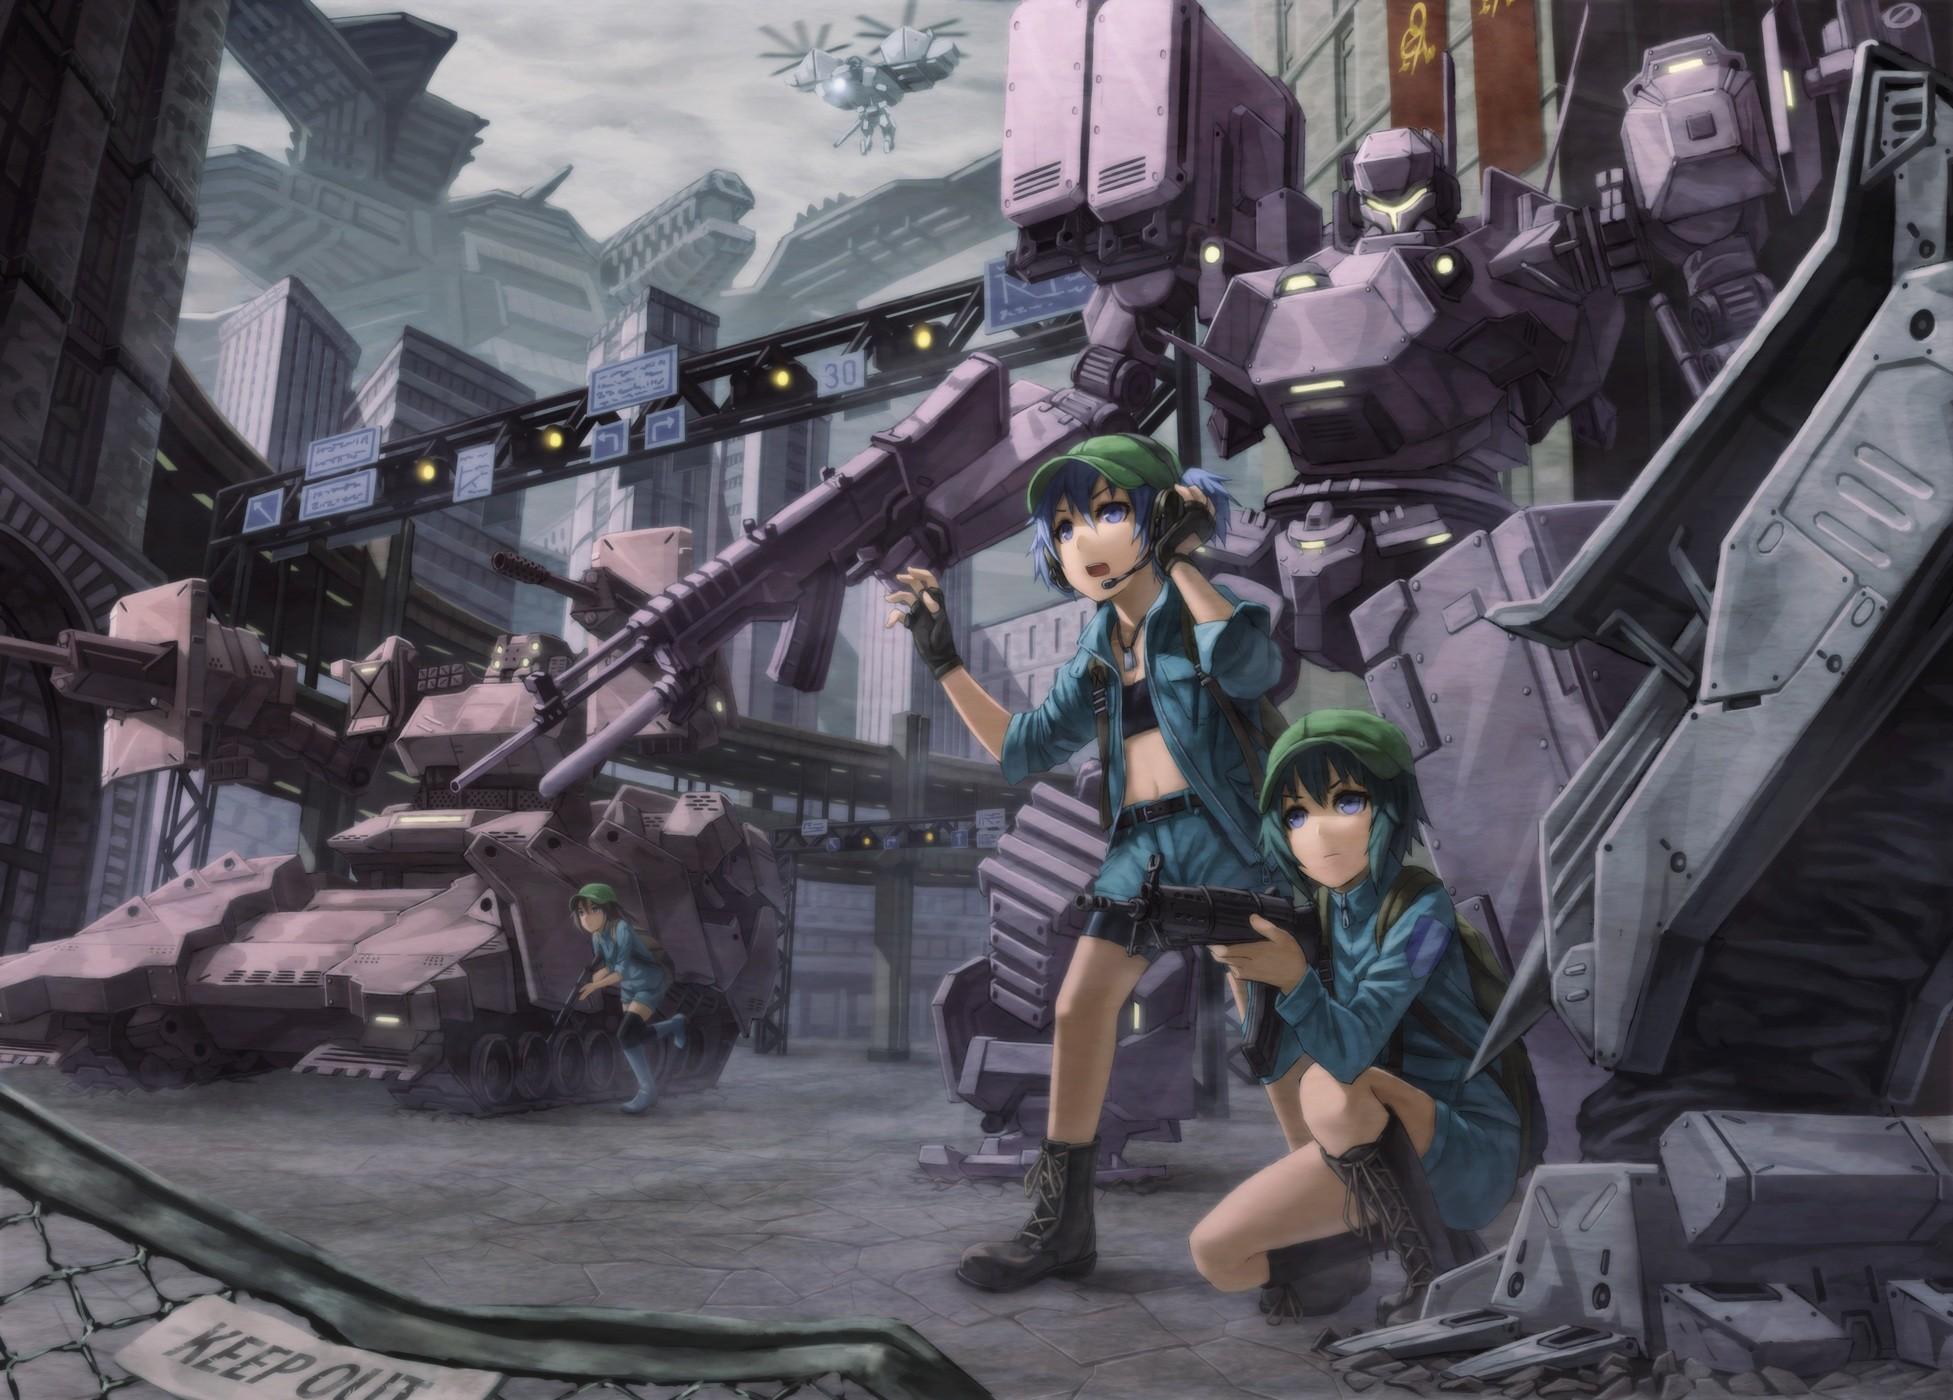 Armored core gun headphones kawashiro nitori kurione (zassou) mecha touhou  weapon wallpaper     65767   WallpaperUP